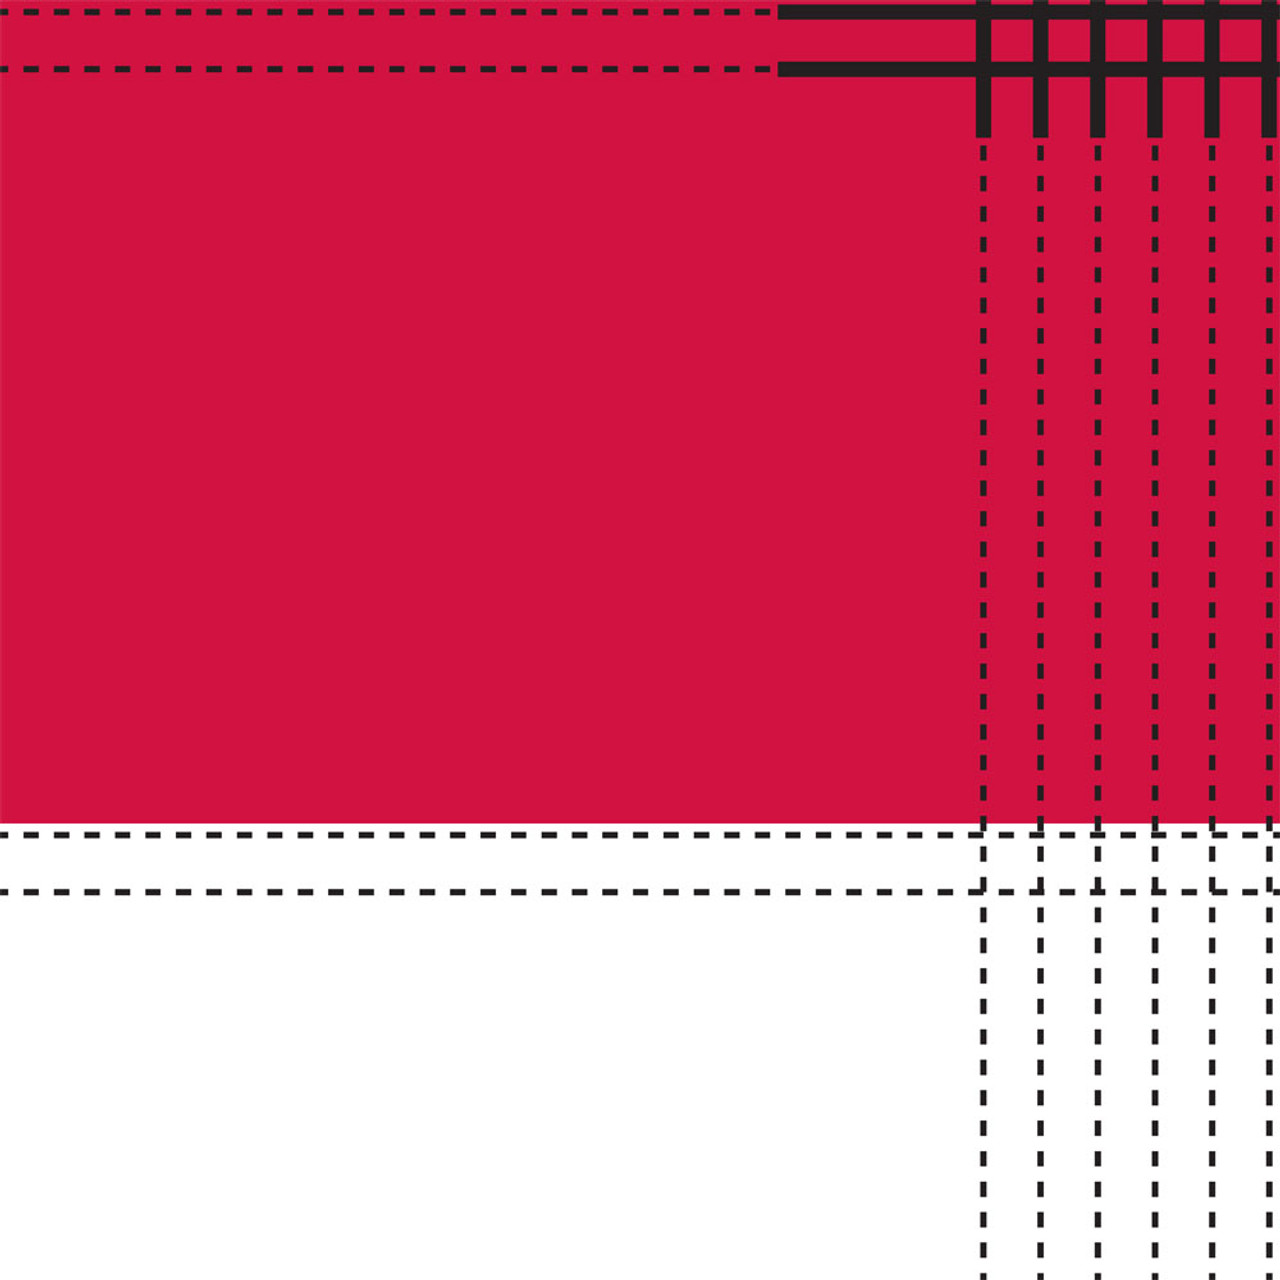 6' x 10' Polyester Texas Flag